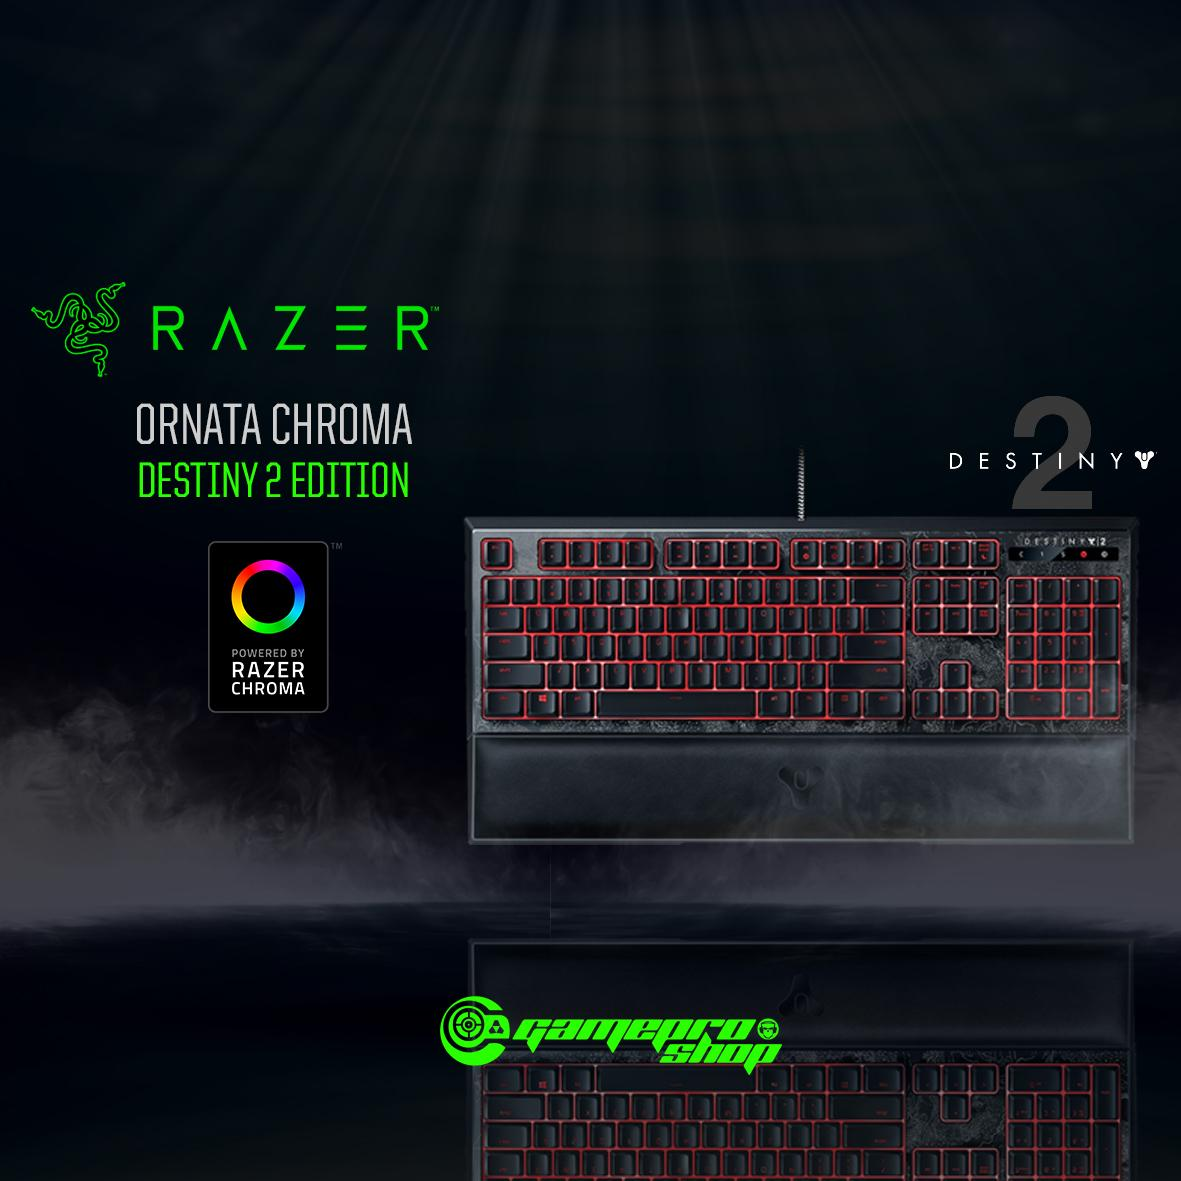 Destiny 2 Razer Ornata Chroma - Multi-color Membrane Gaming Keyboard  Singapore